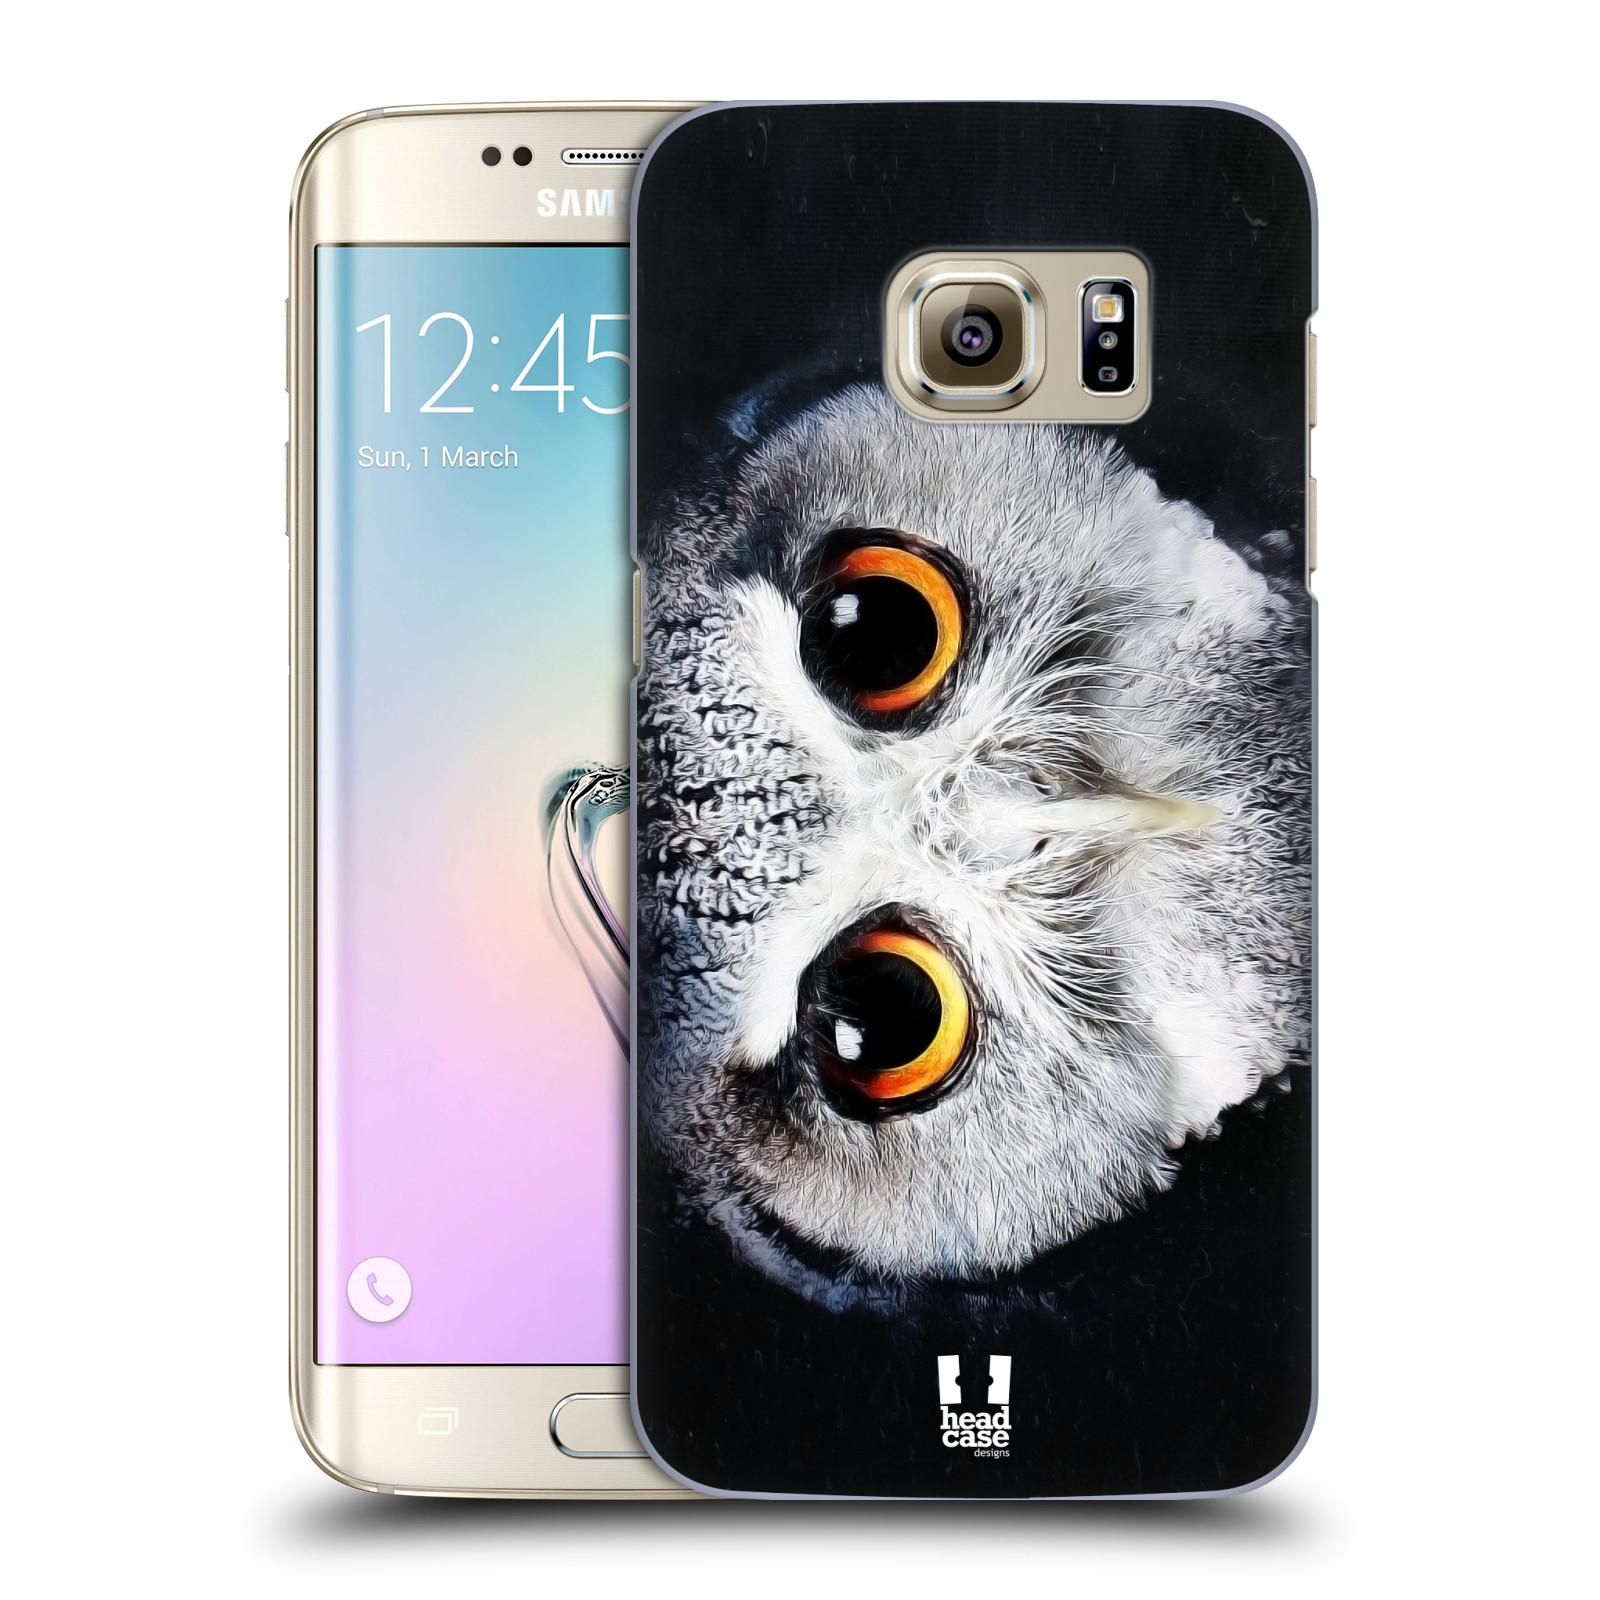 HEAD CASE plastový obal na mobil SAMSUNG GALAXY S7 EDGE vzor Zvířecí tváře sova